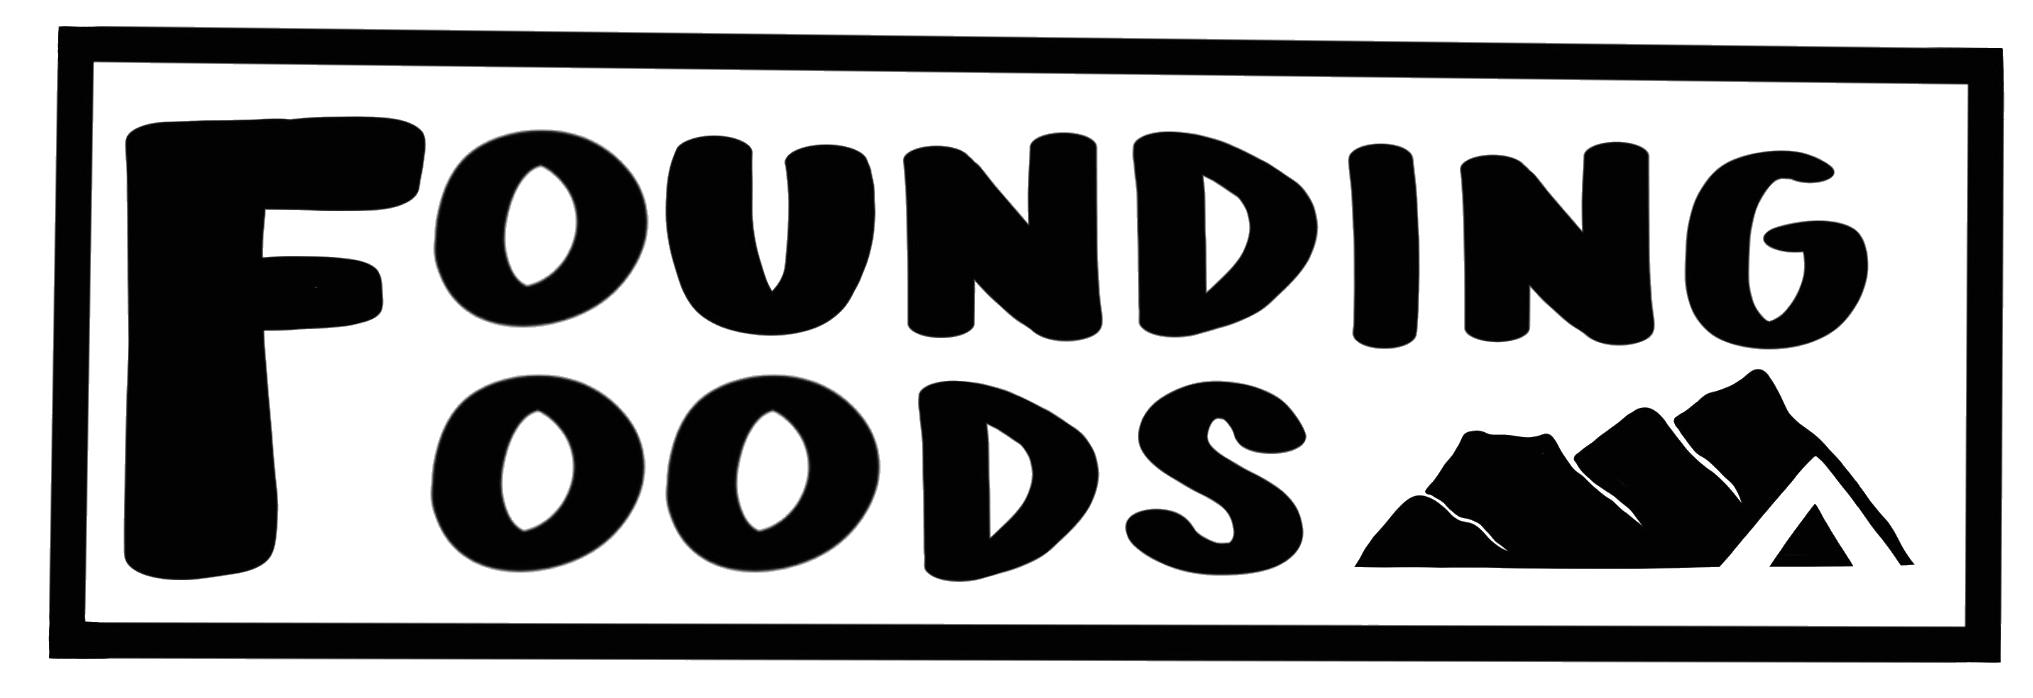 FF logo - no background 2.png